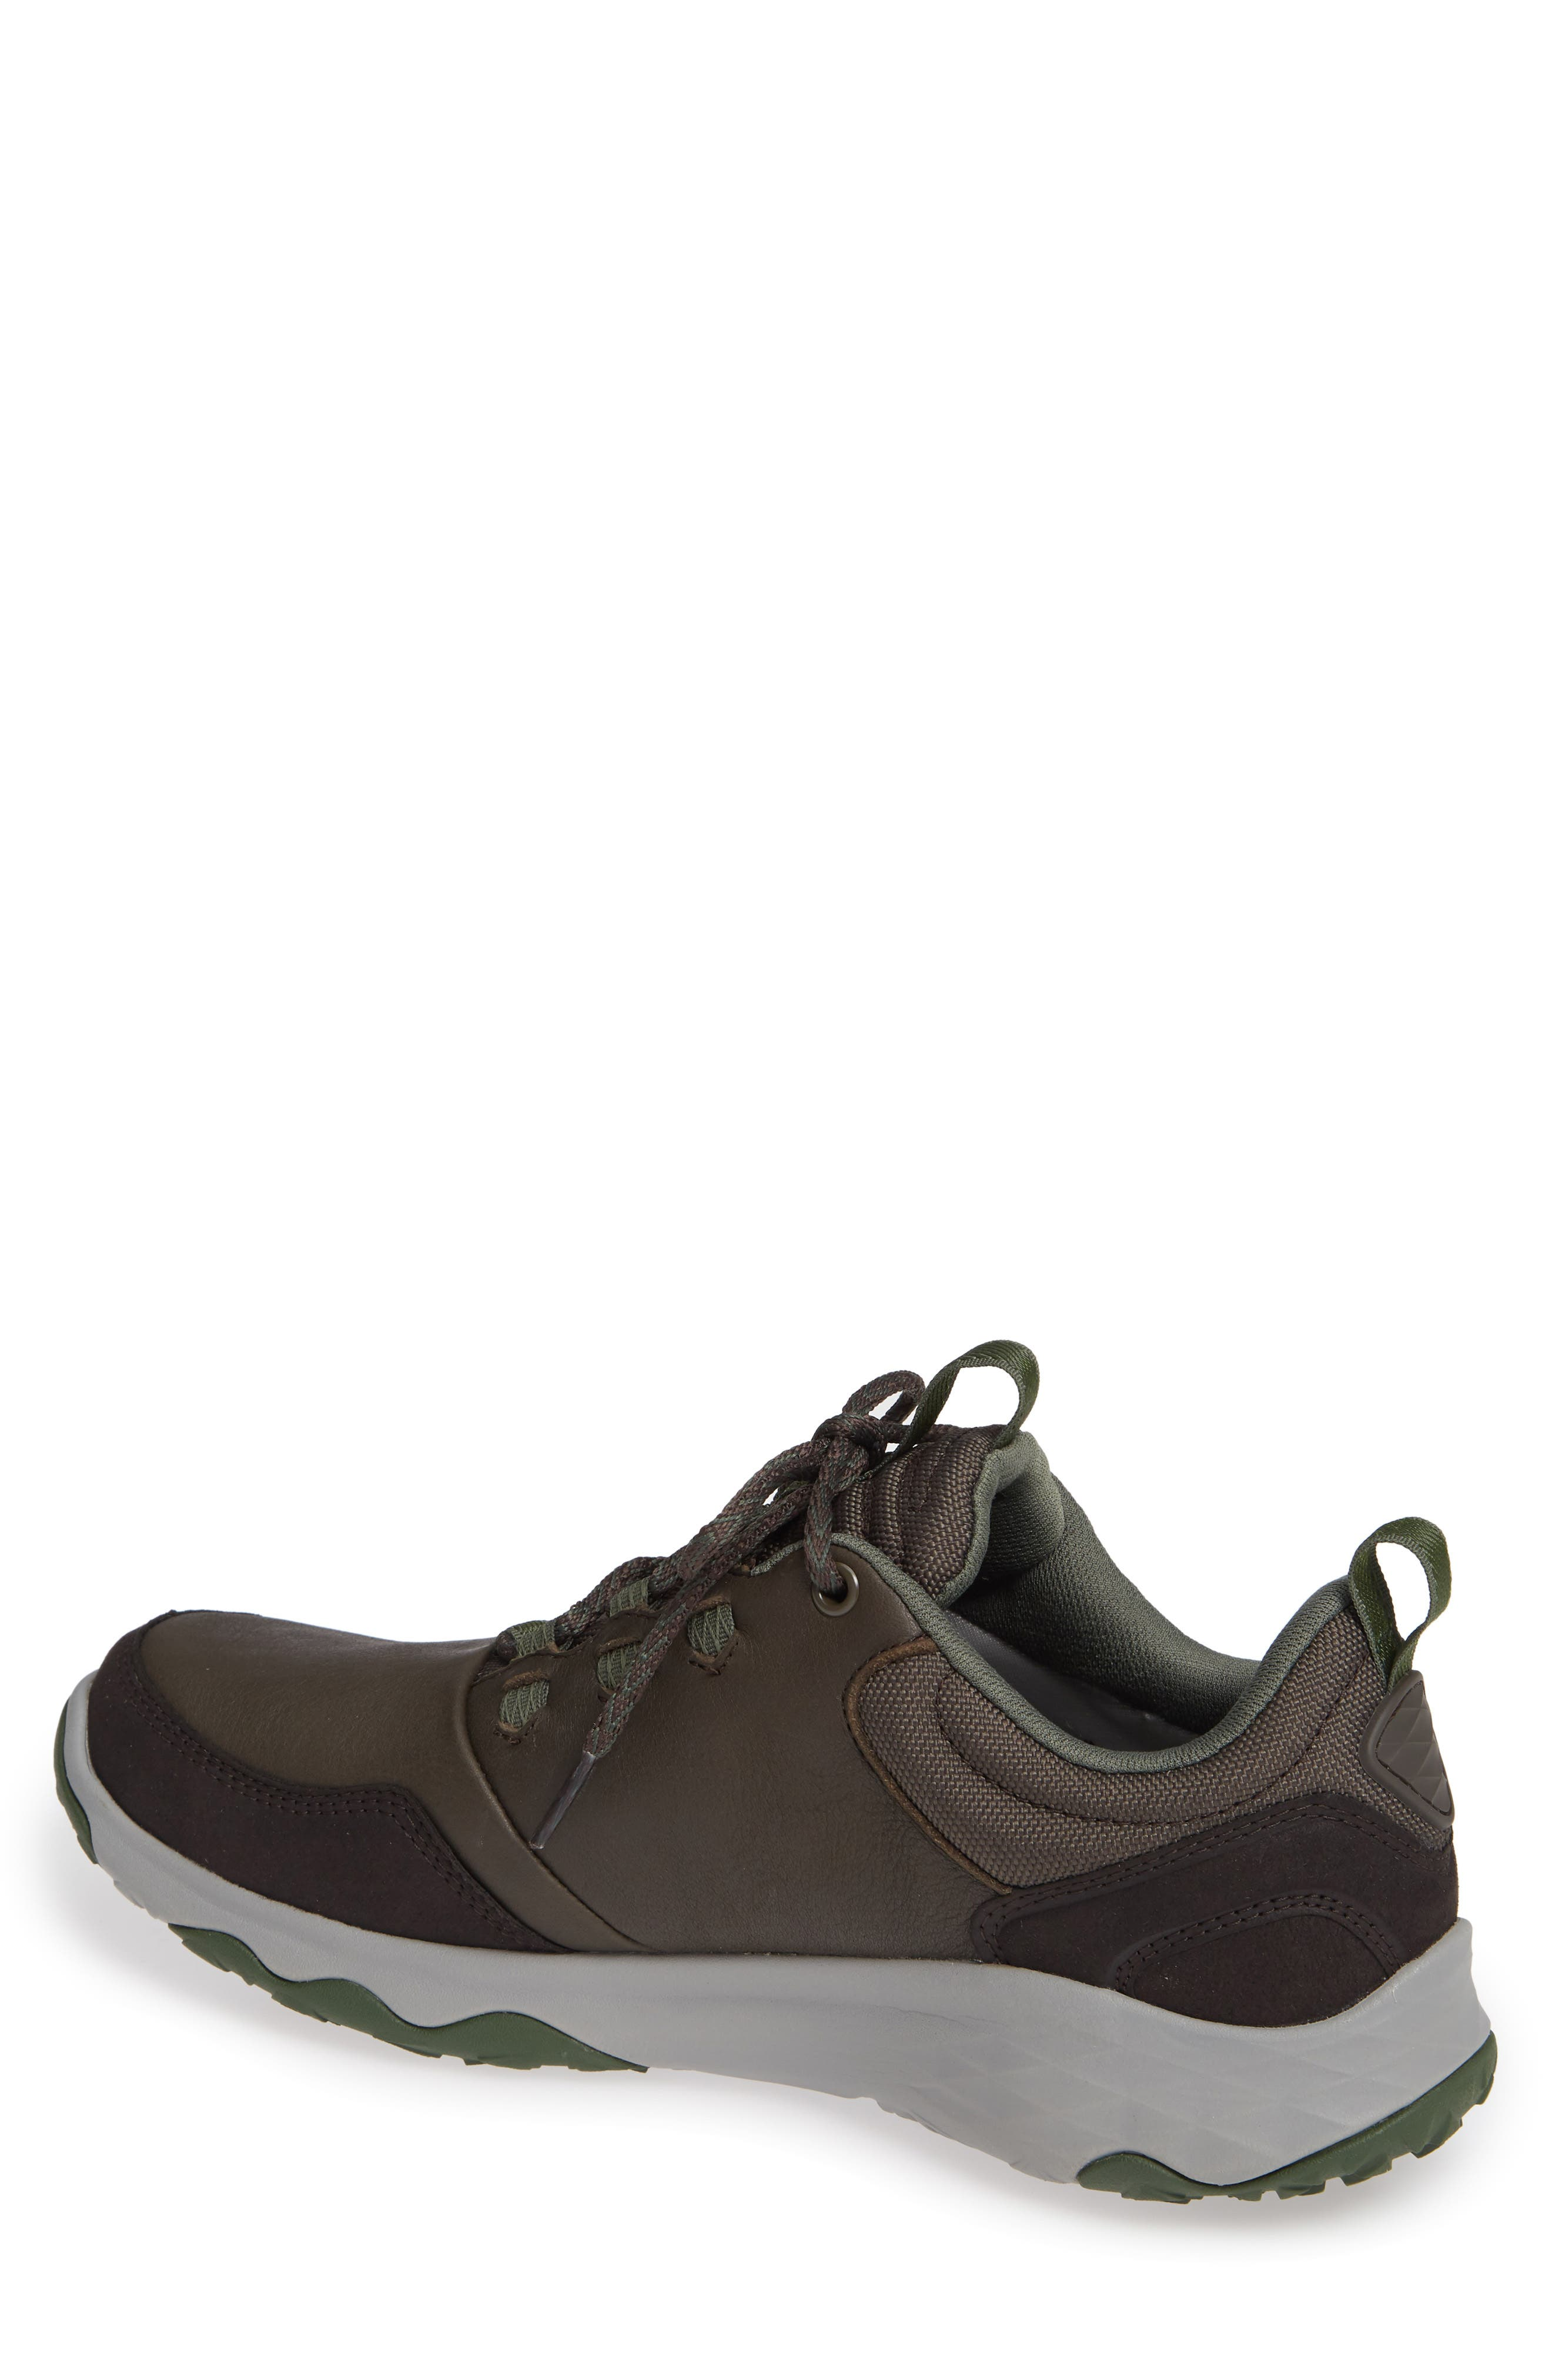 Arrowood Waterproof Sneaker,                             Alternate thumbnail 2, color,                             BLACK OLIVE LEATHER